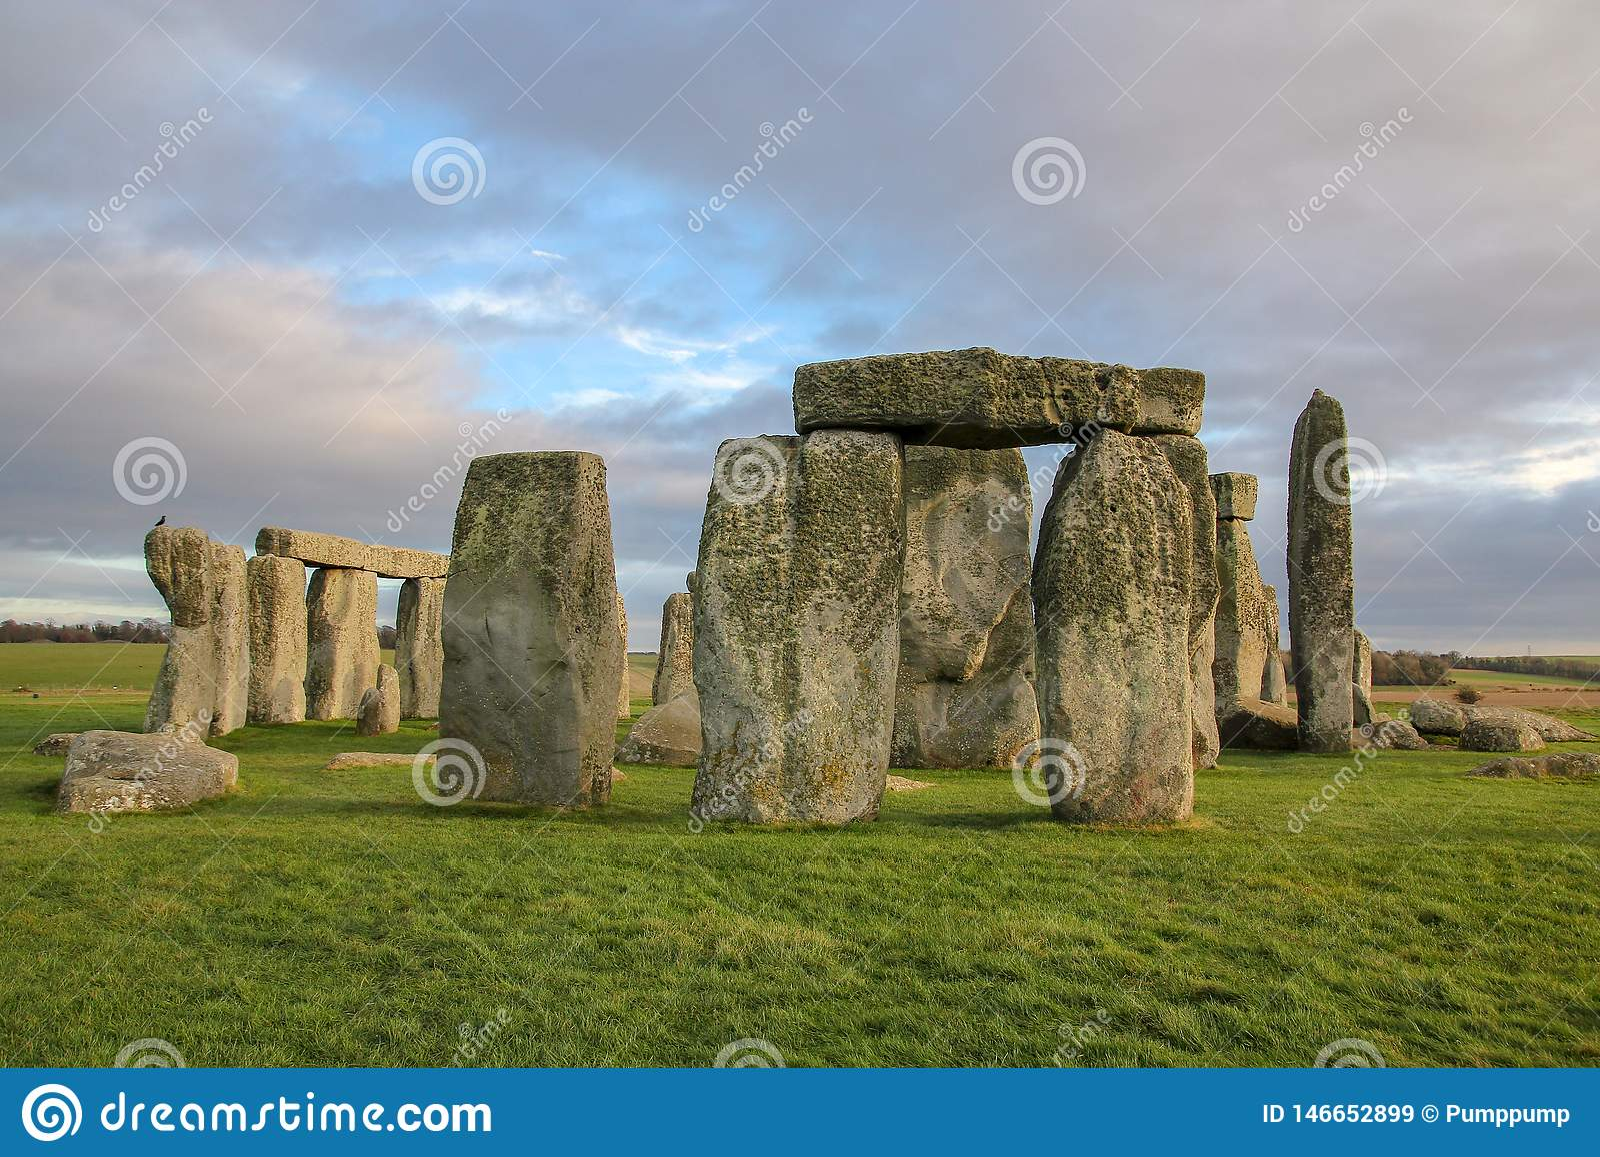 the stones of Stonehenge, a prehistoric monument in Wiltshire, England. UNESCO World Heritage